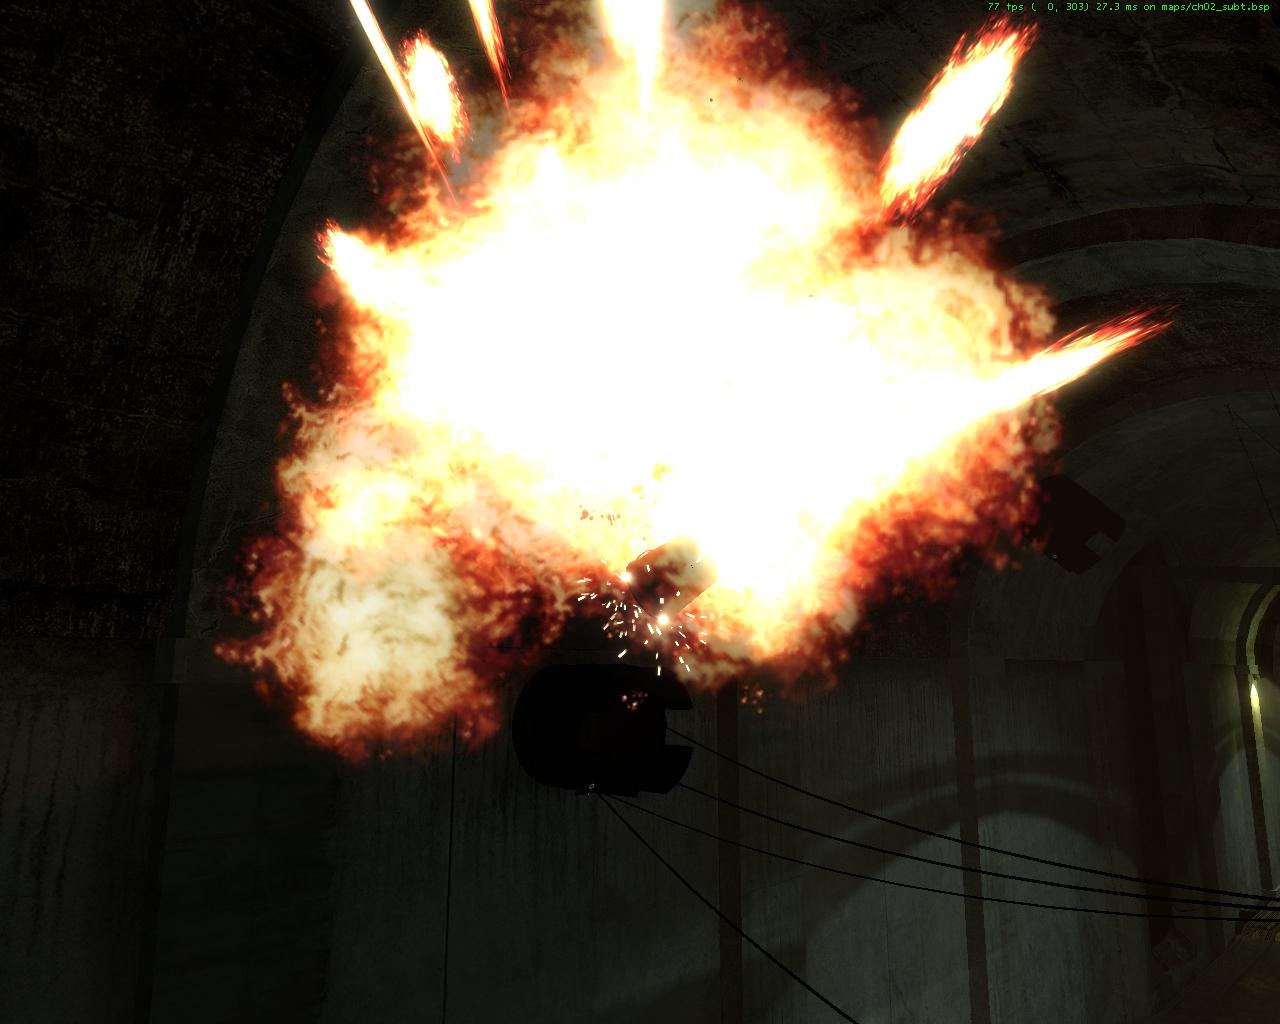 ch02_subt0080.jpg - Half-Life 2 ch02_subt, Dark Interval, Dark Interval: Part 1